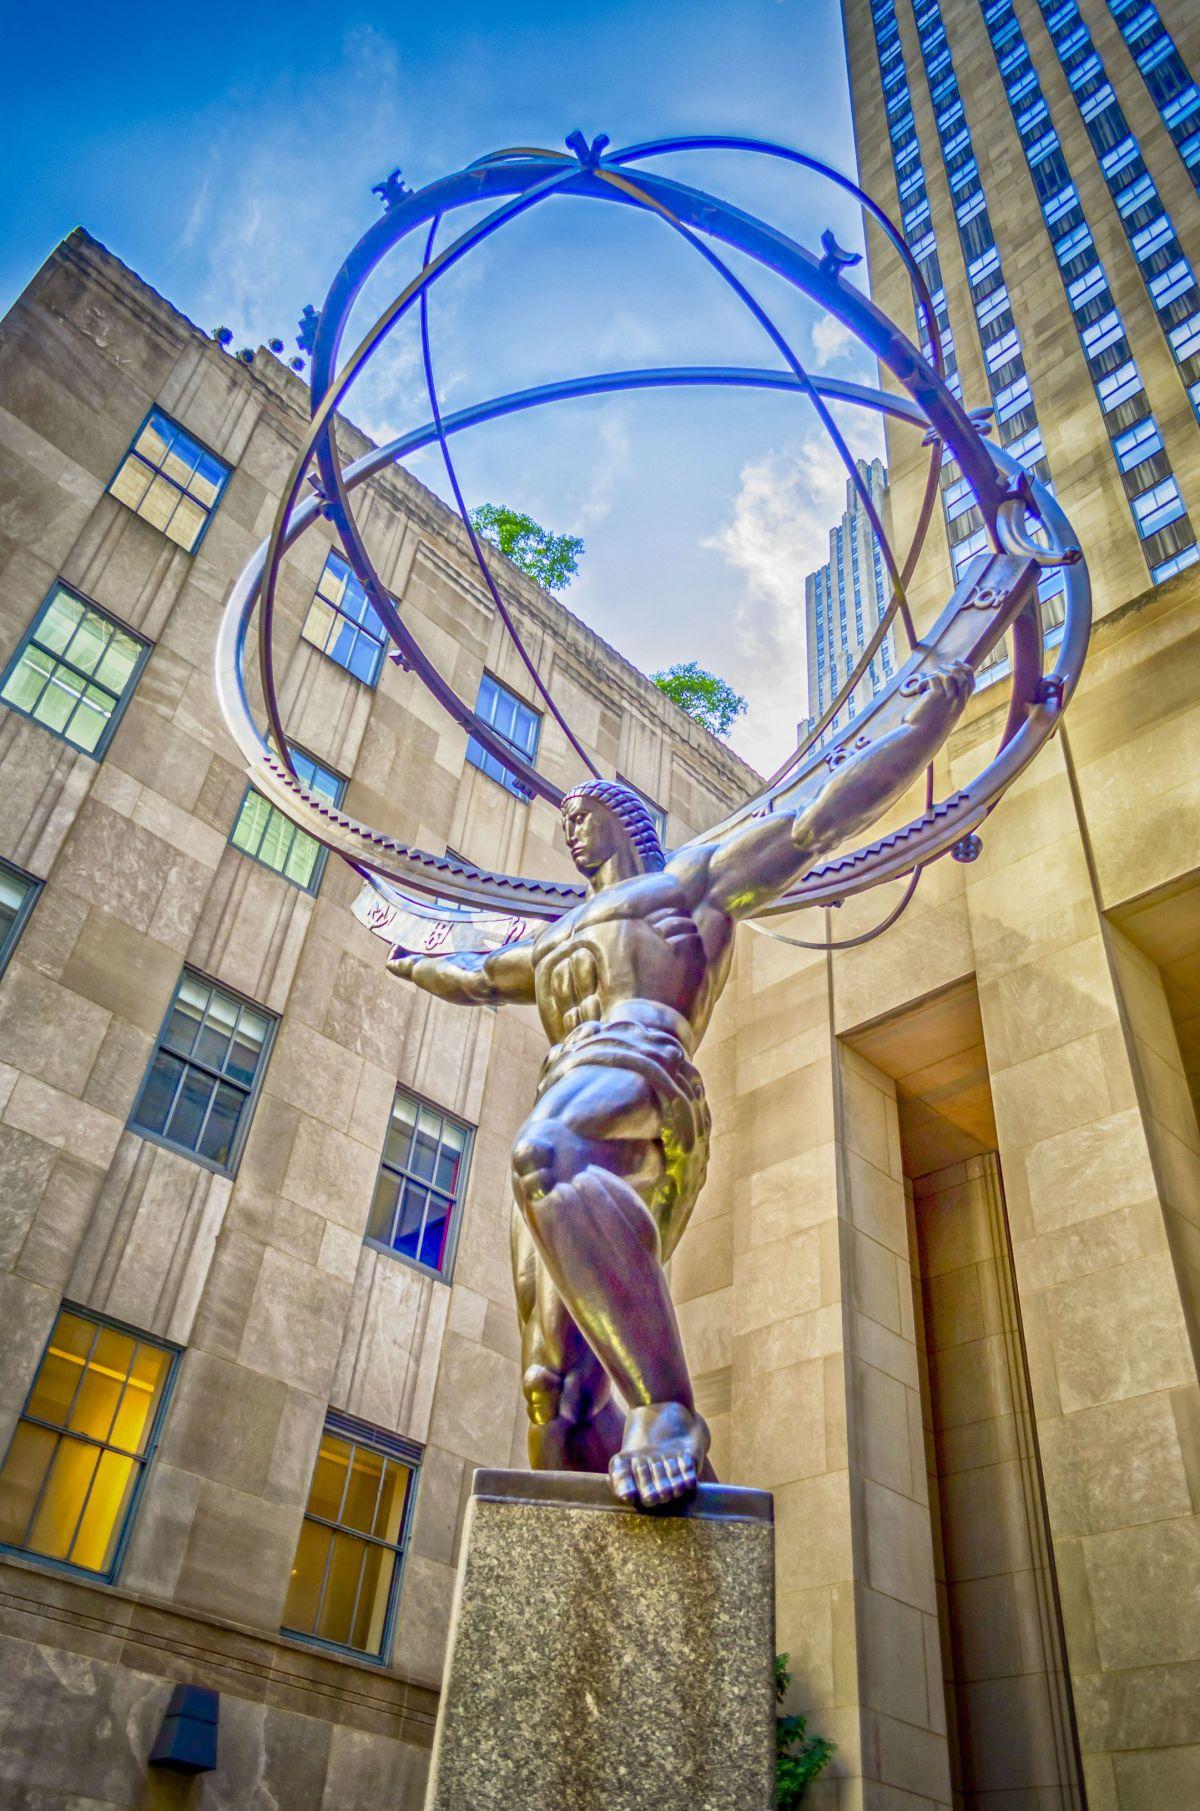 Economics in Ayn Rand's AtlasShrugged